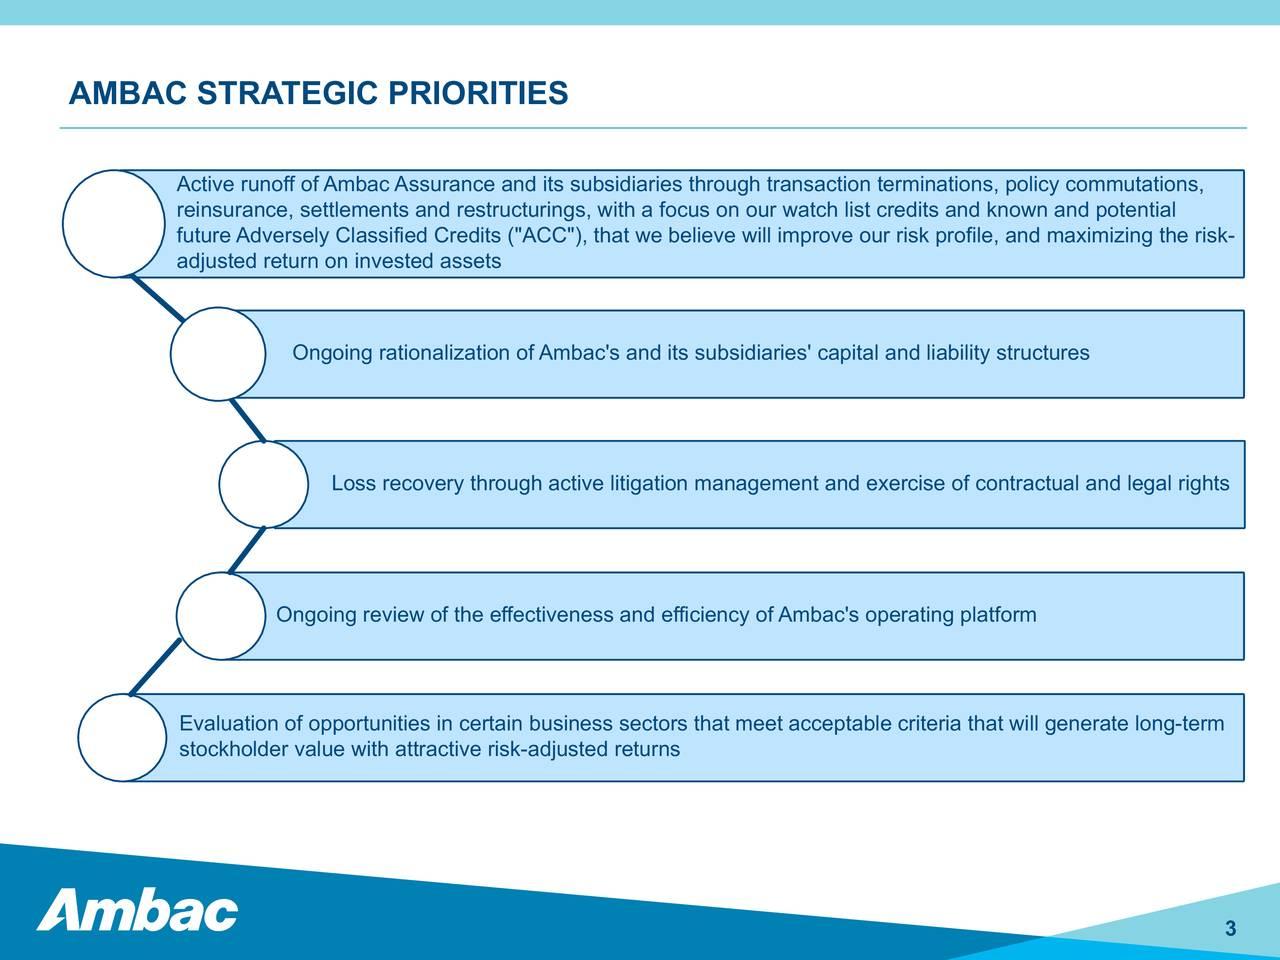 AMBAC STRATEGIC PRIORITIES